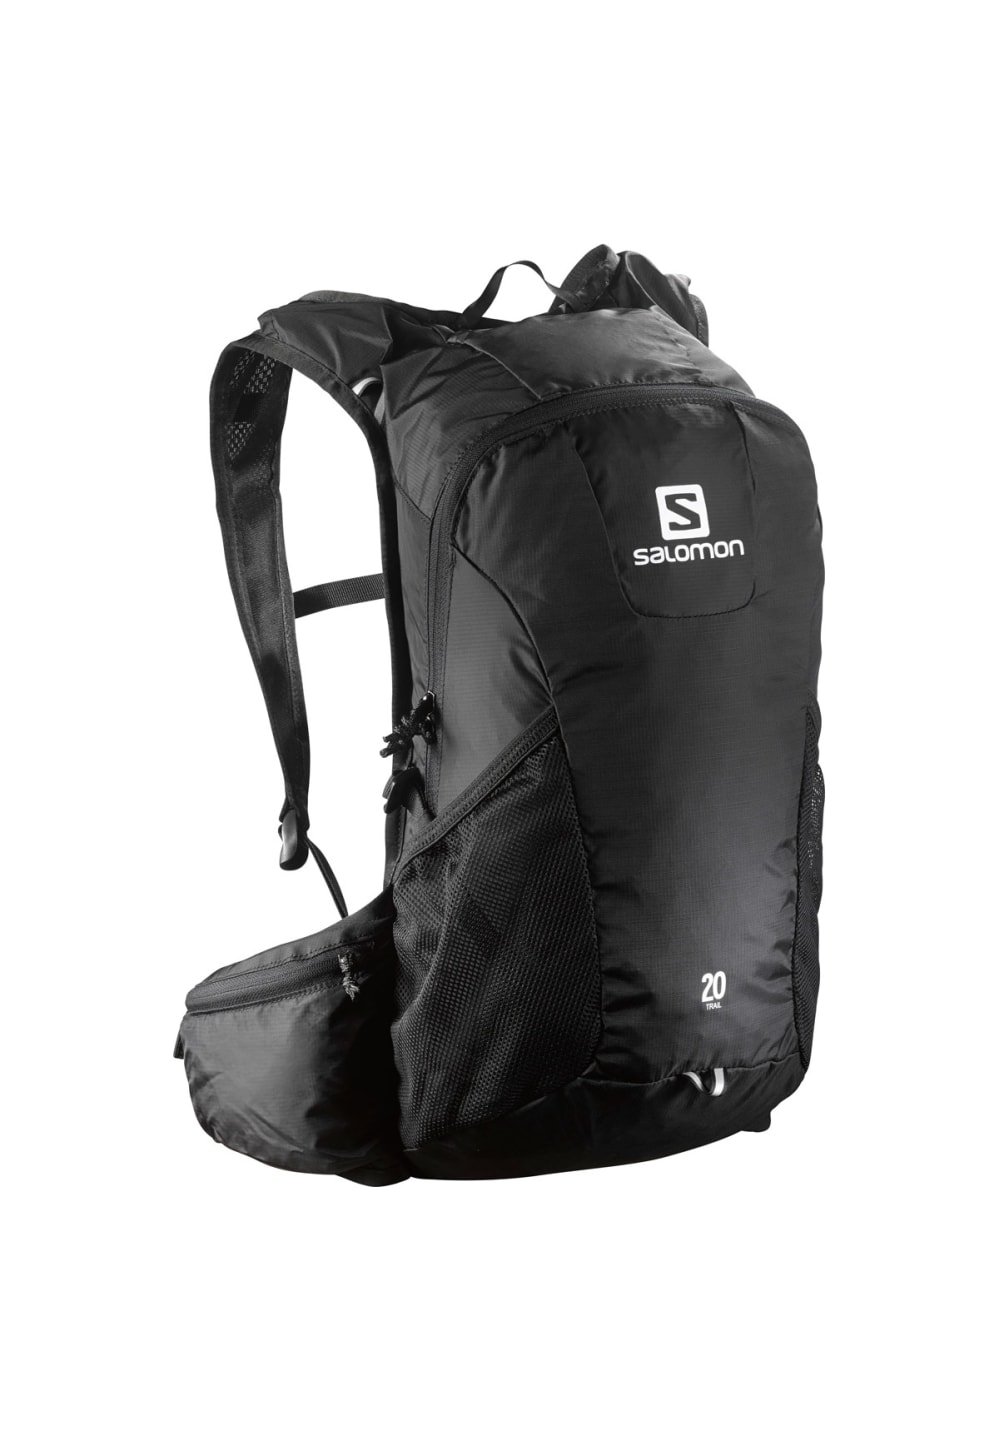 chaussures de séparation b62f5 95802 Salomon Rucksack Trail 20 - Backpacks - Black